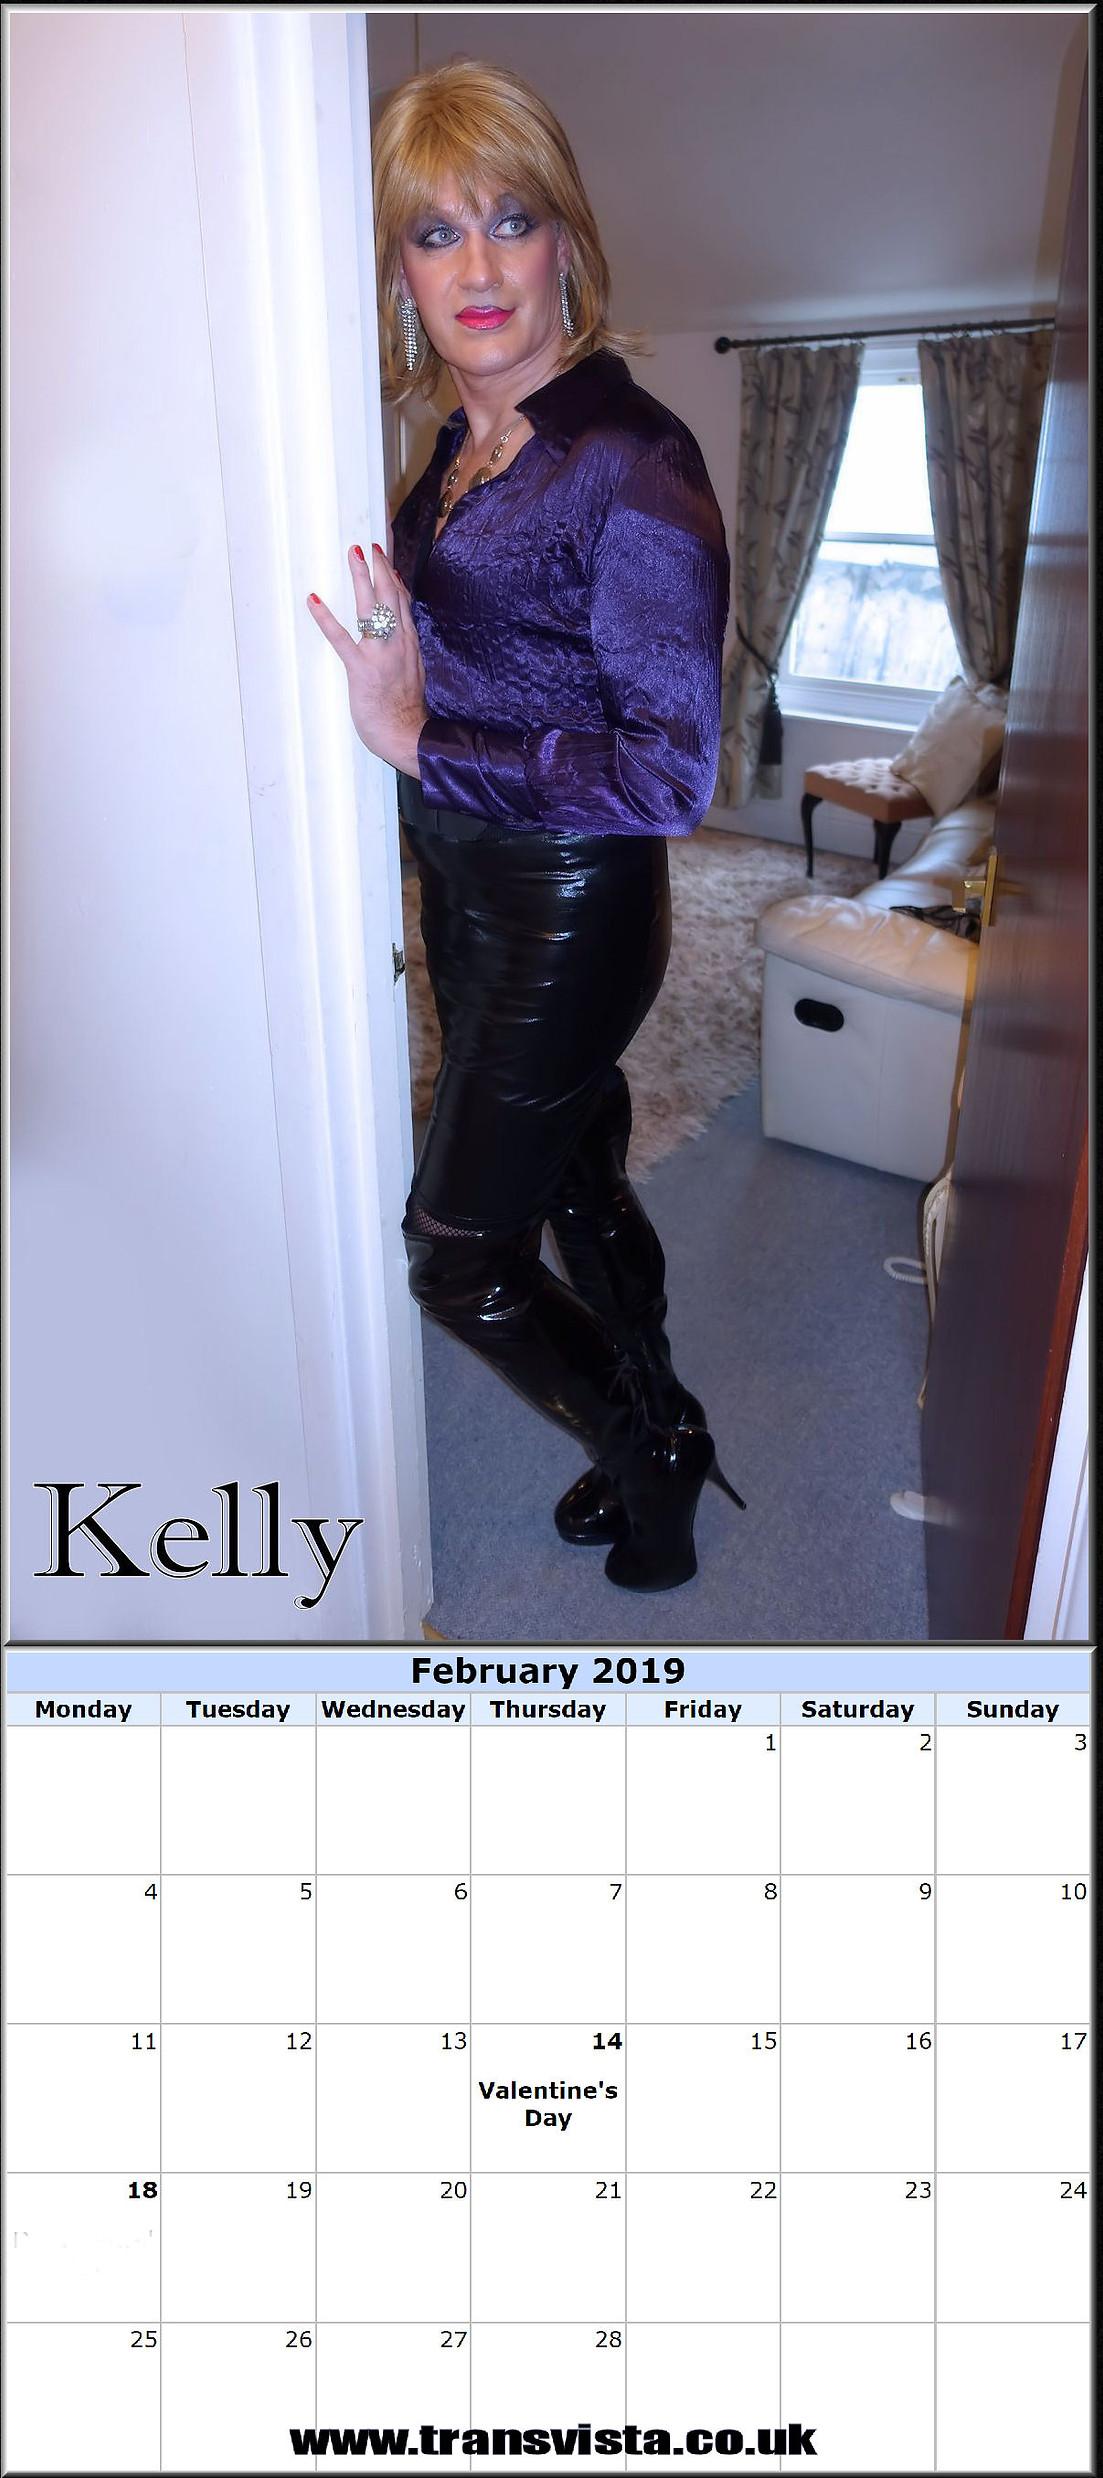 KellyFeb2019CalendarGirl.jpg